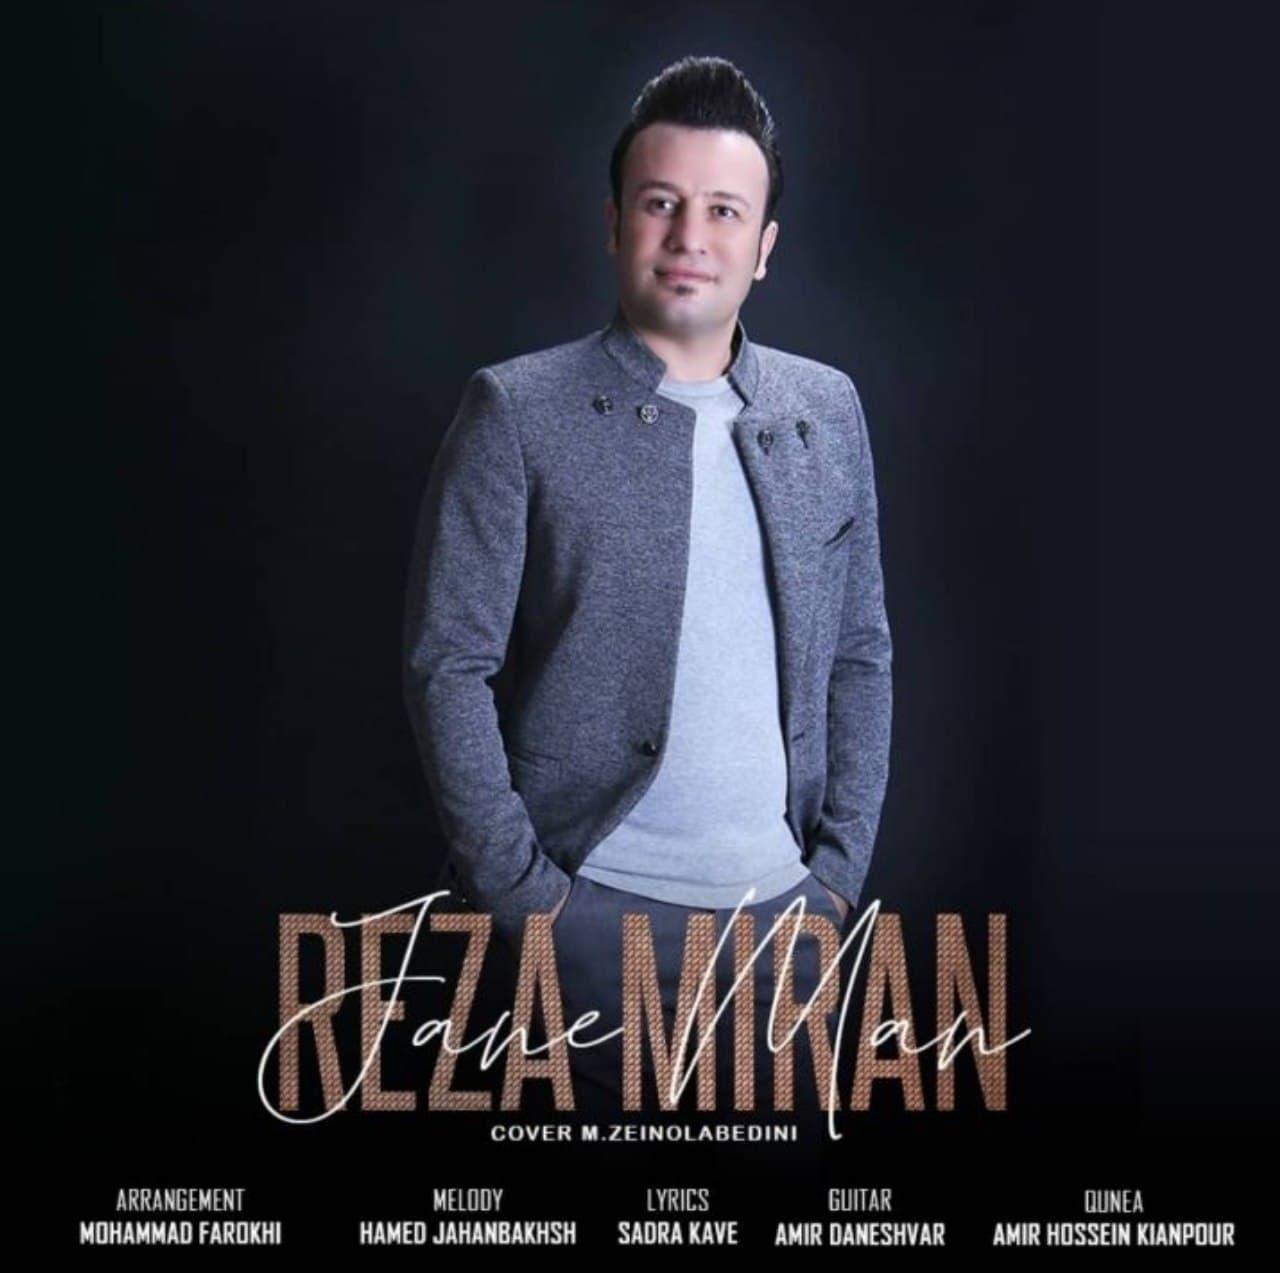 Reza Miran – Jane Man